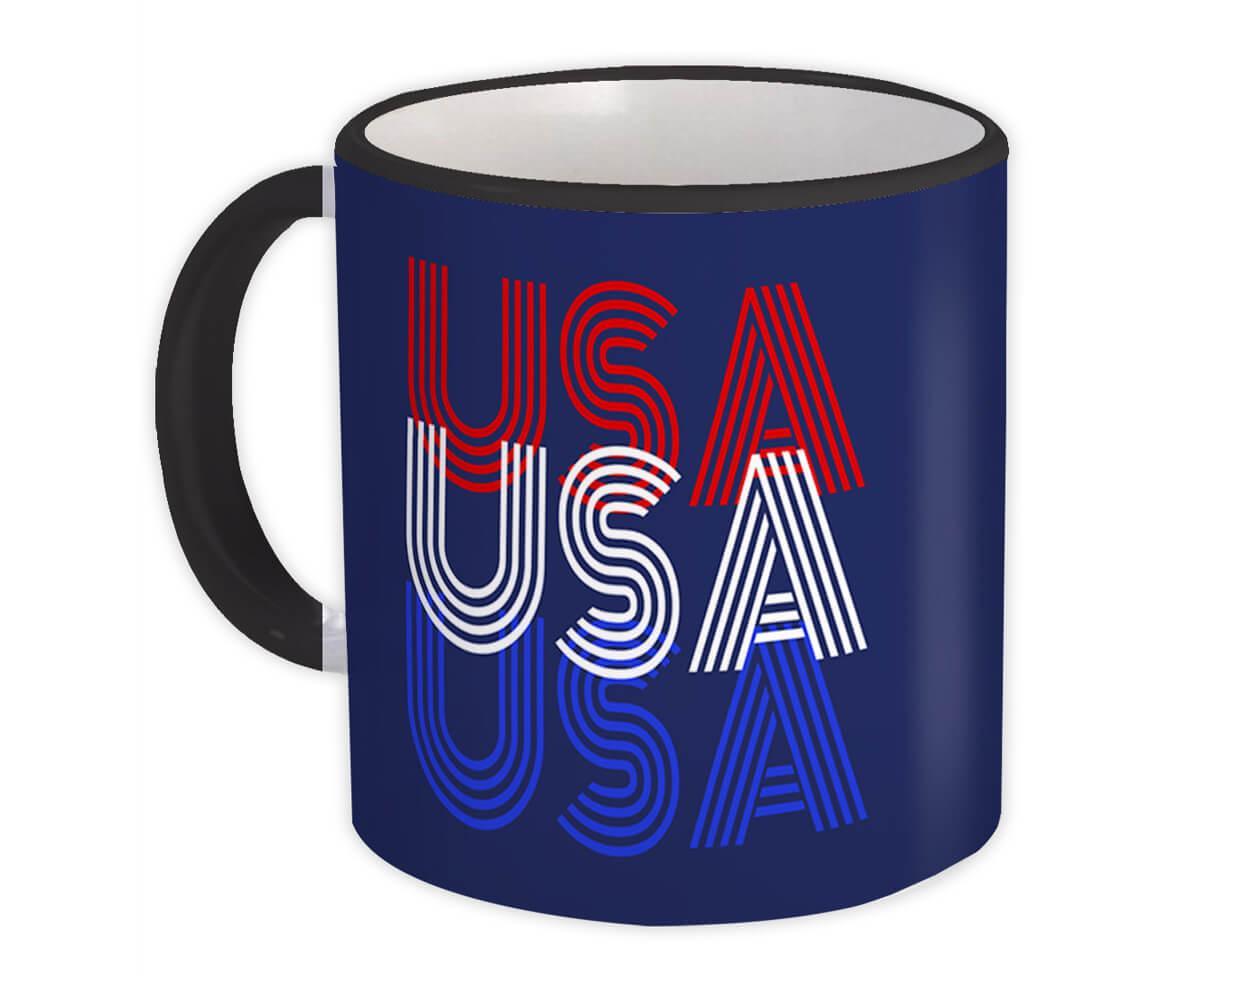 USA : Gift Mug United States Patriotic American Americana 4th July